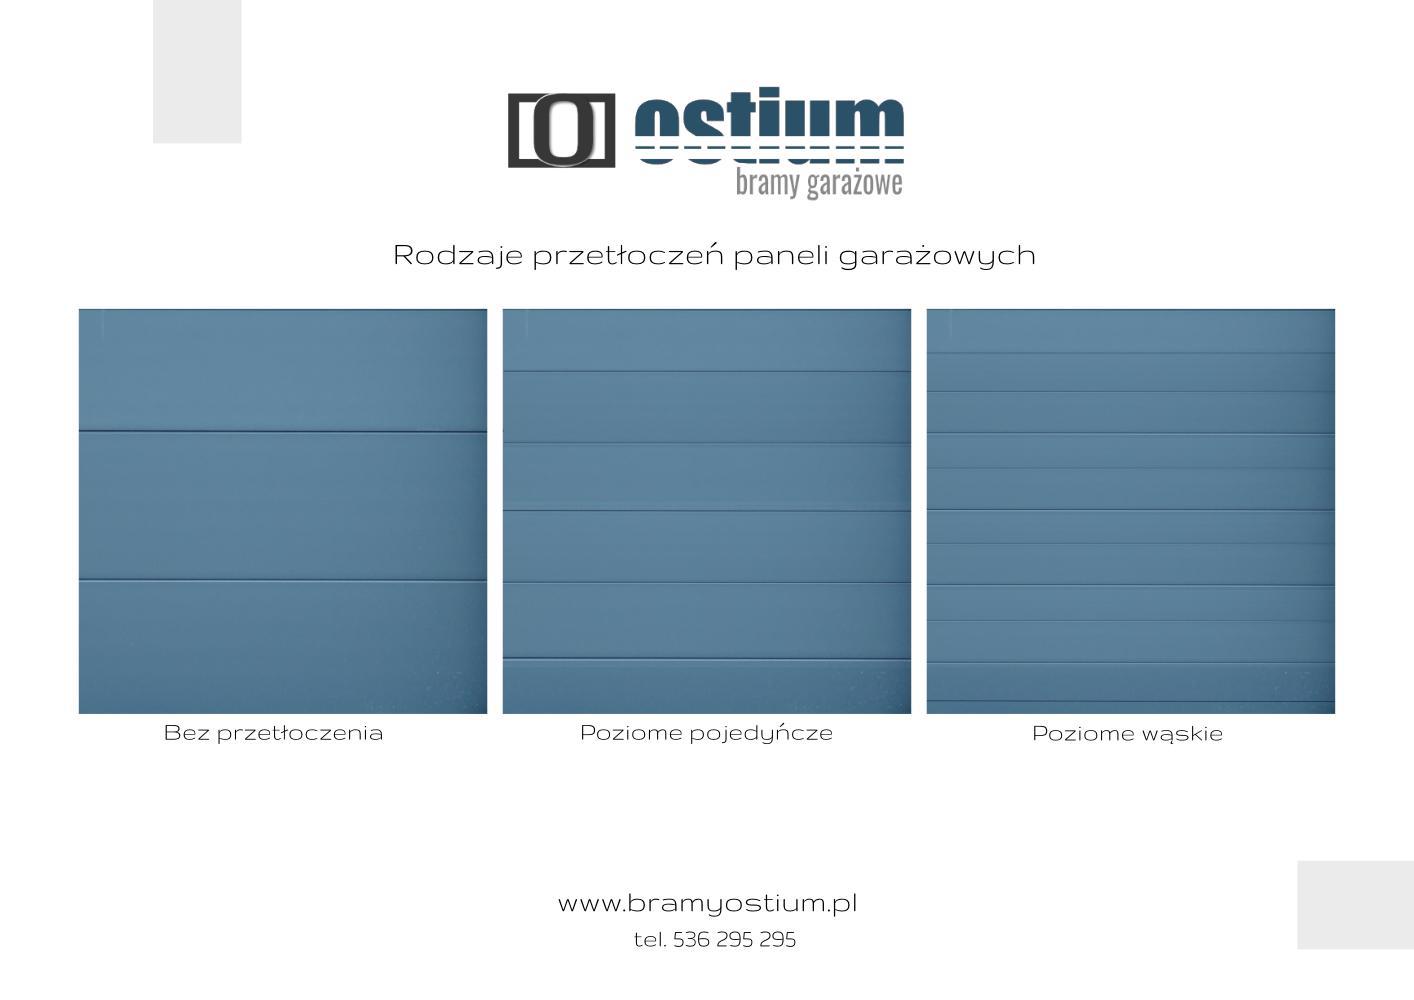 Producent bram garażowych Ostium